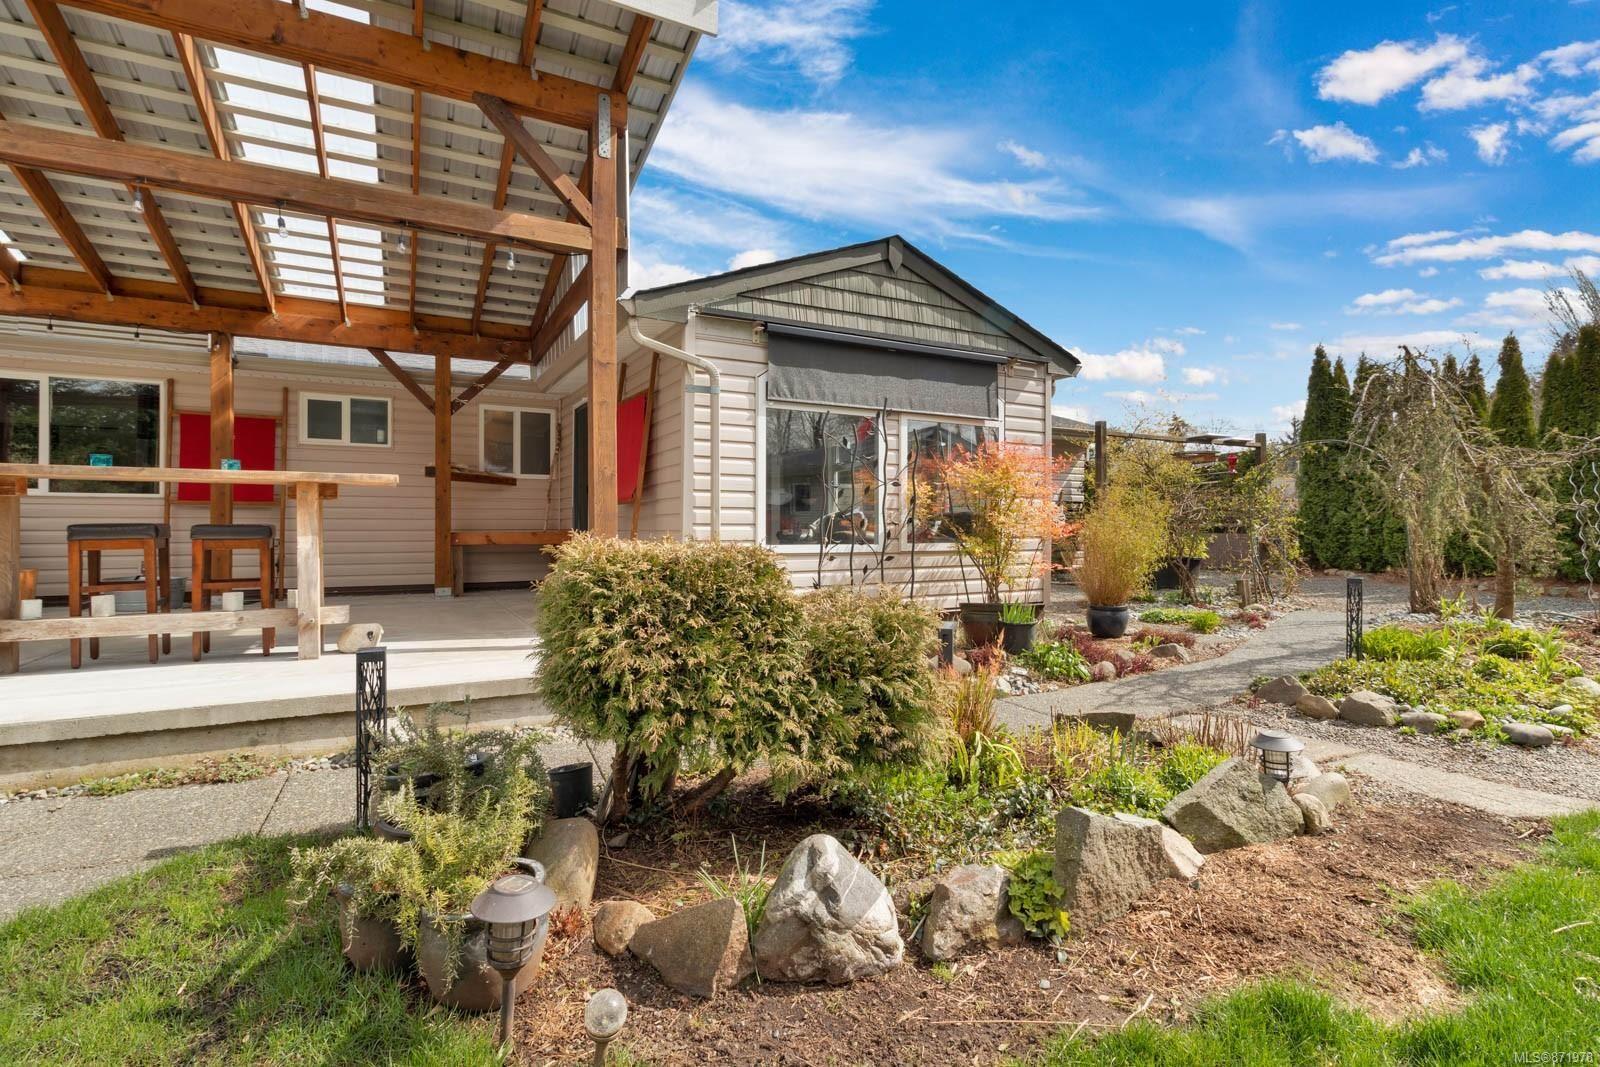 Photo 27: Photos: 1539 Chilcotin Cres in : CV Comox (Town of) House for sale (Comox Valley)  : MLS®# 871978